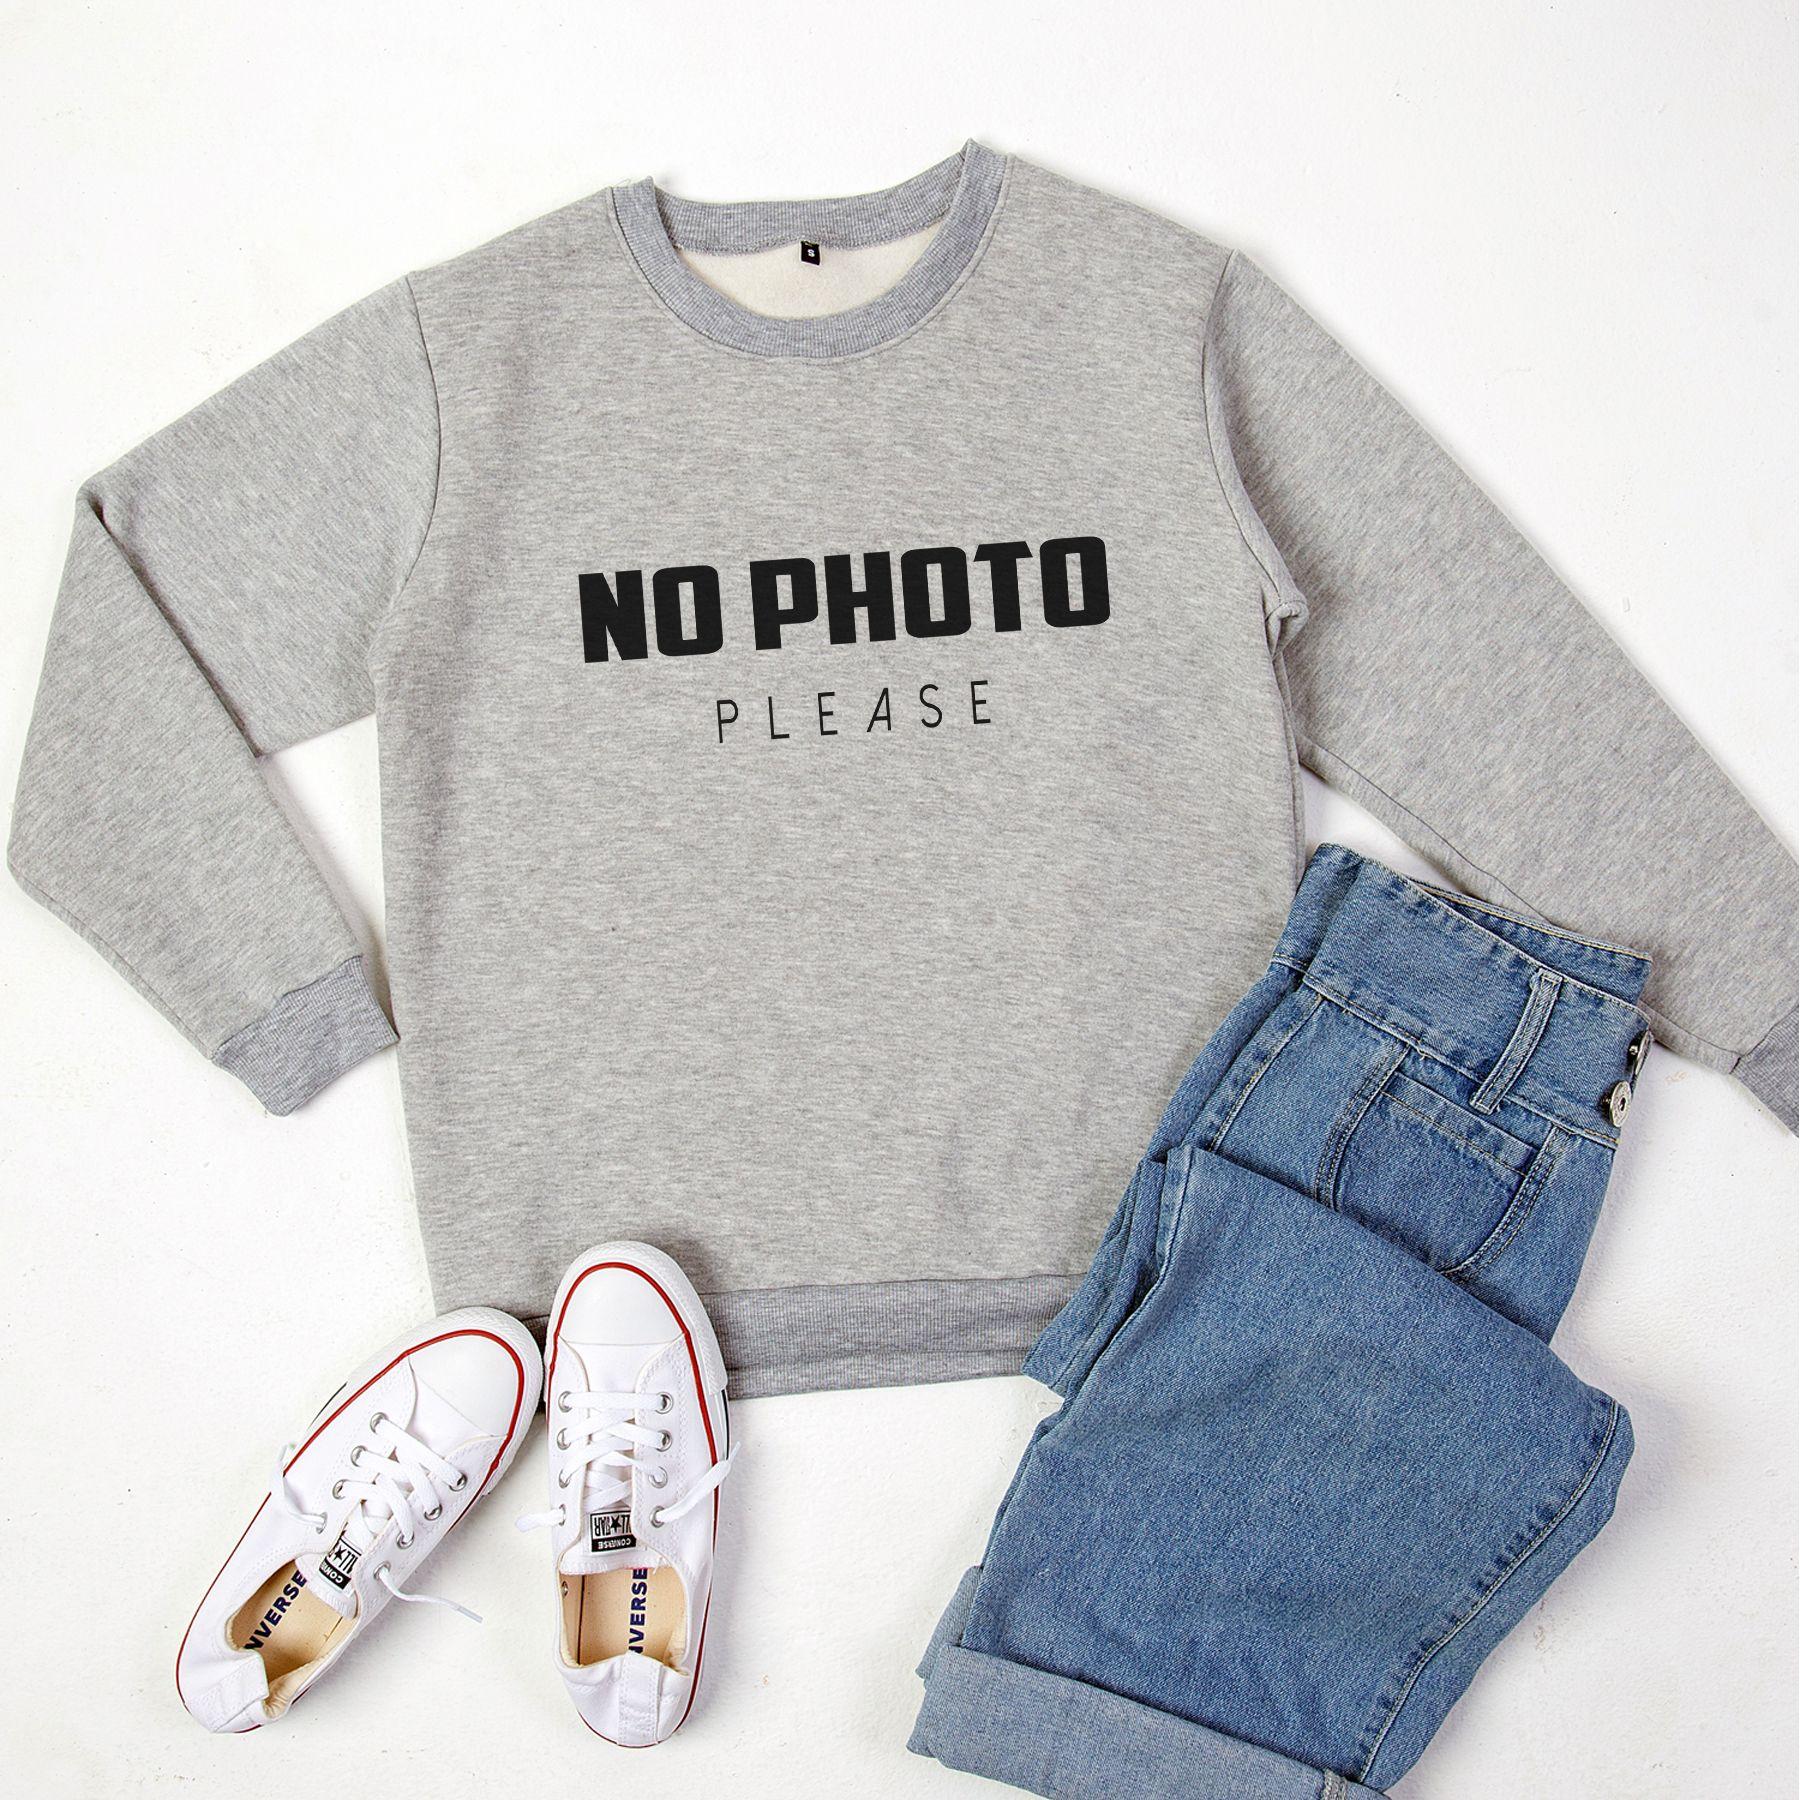 No Photo Please Funny Saying Sweatshirt Women Tumblr Shirt For Etsy Crewneck Sweatshirt Women Sweatshirts Women Womens Crewneck [ 1800 x 1800 Pixel ]